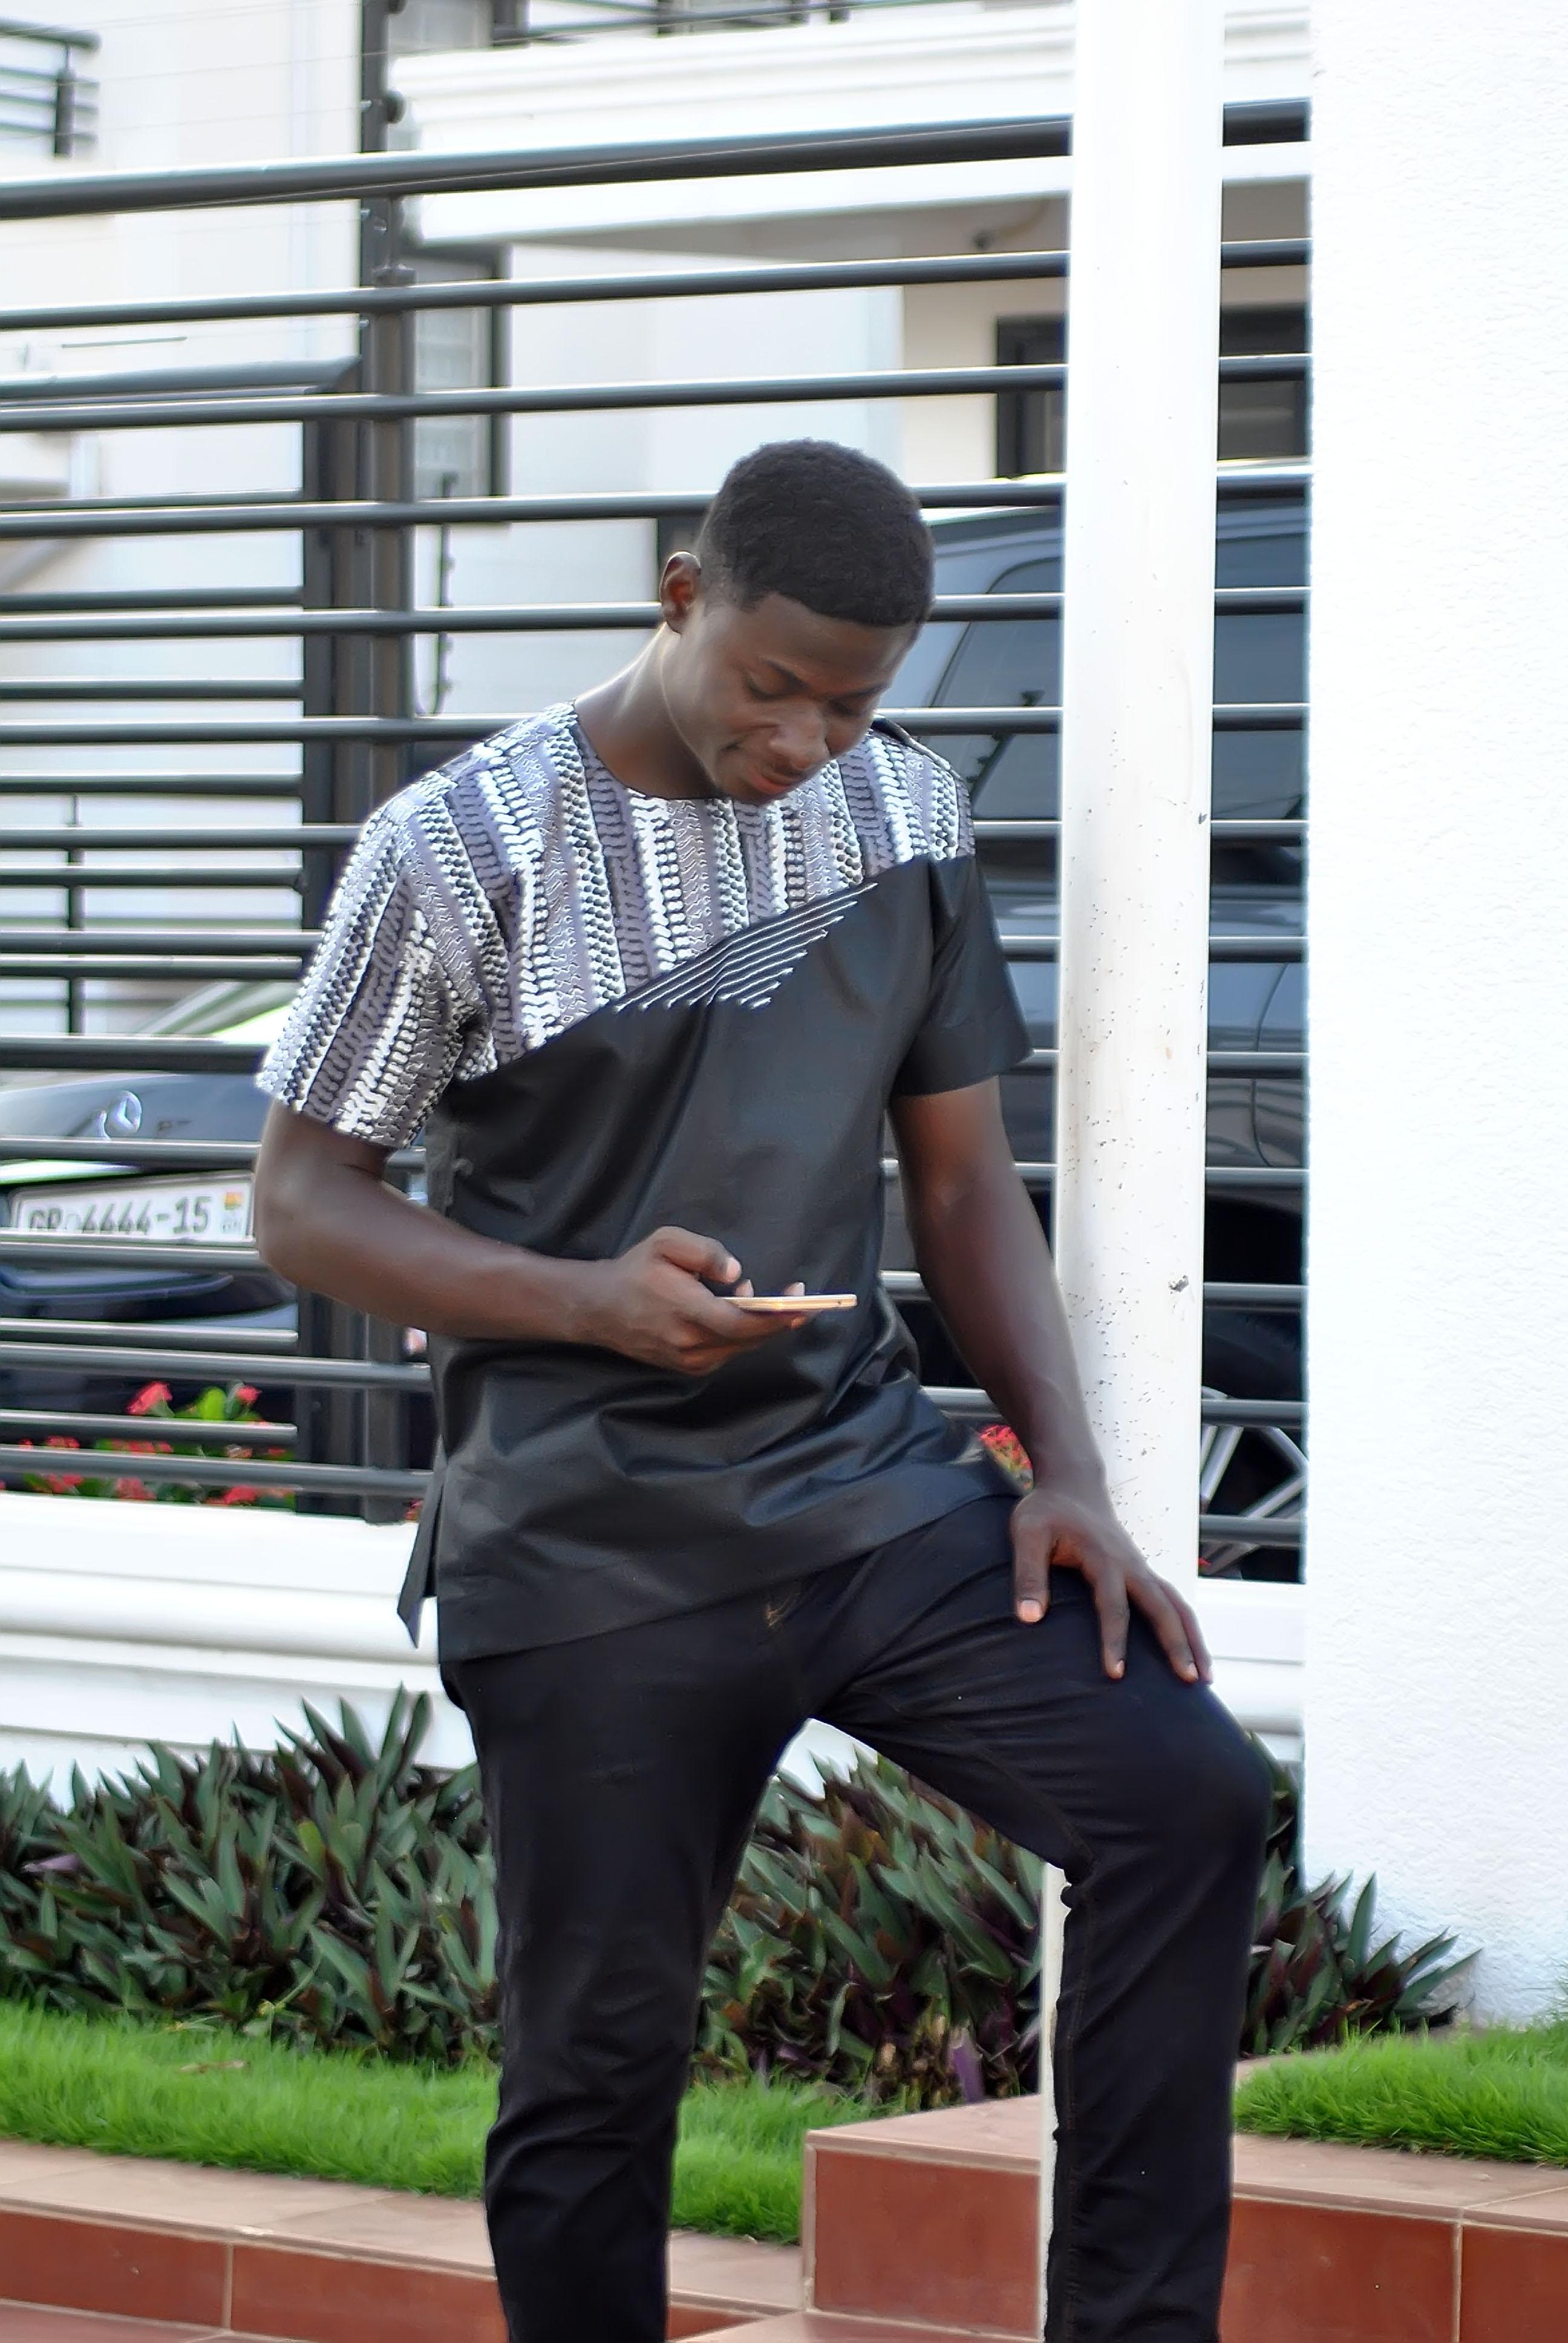 27031b4dc32c Ankara Men's African Short Sleeve Shirt African Clothing Casual ...